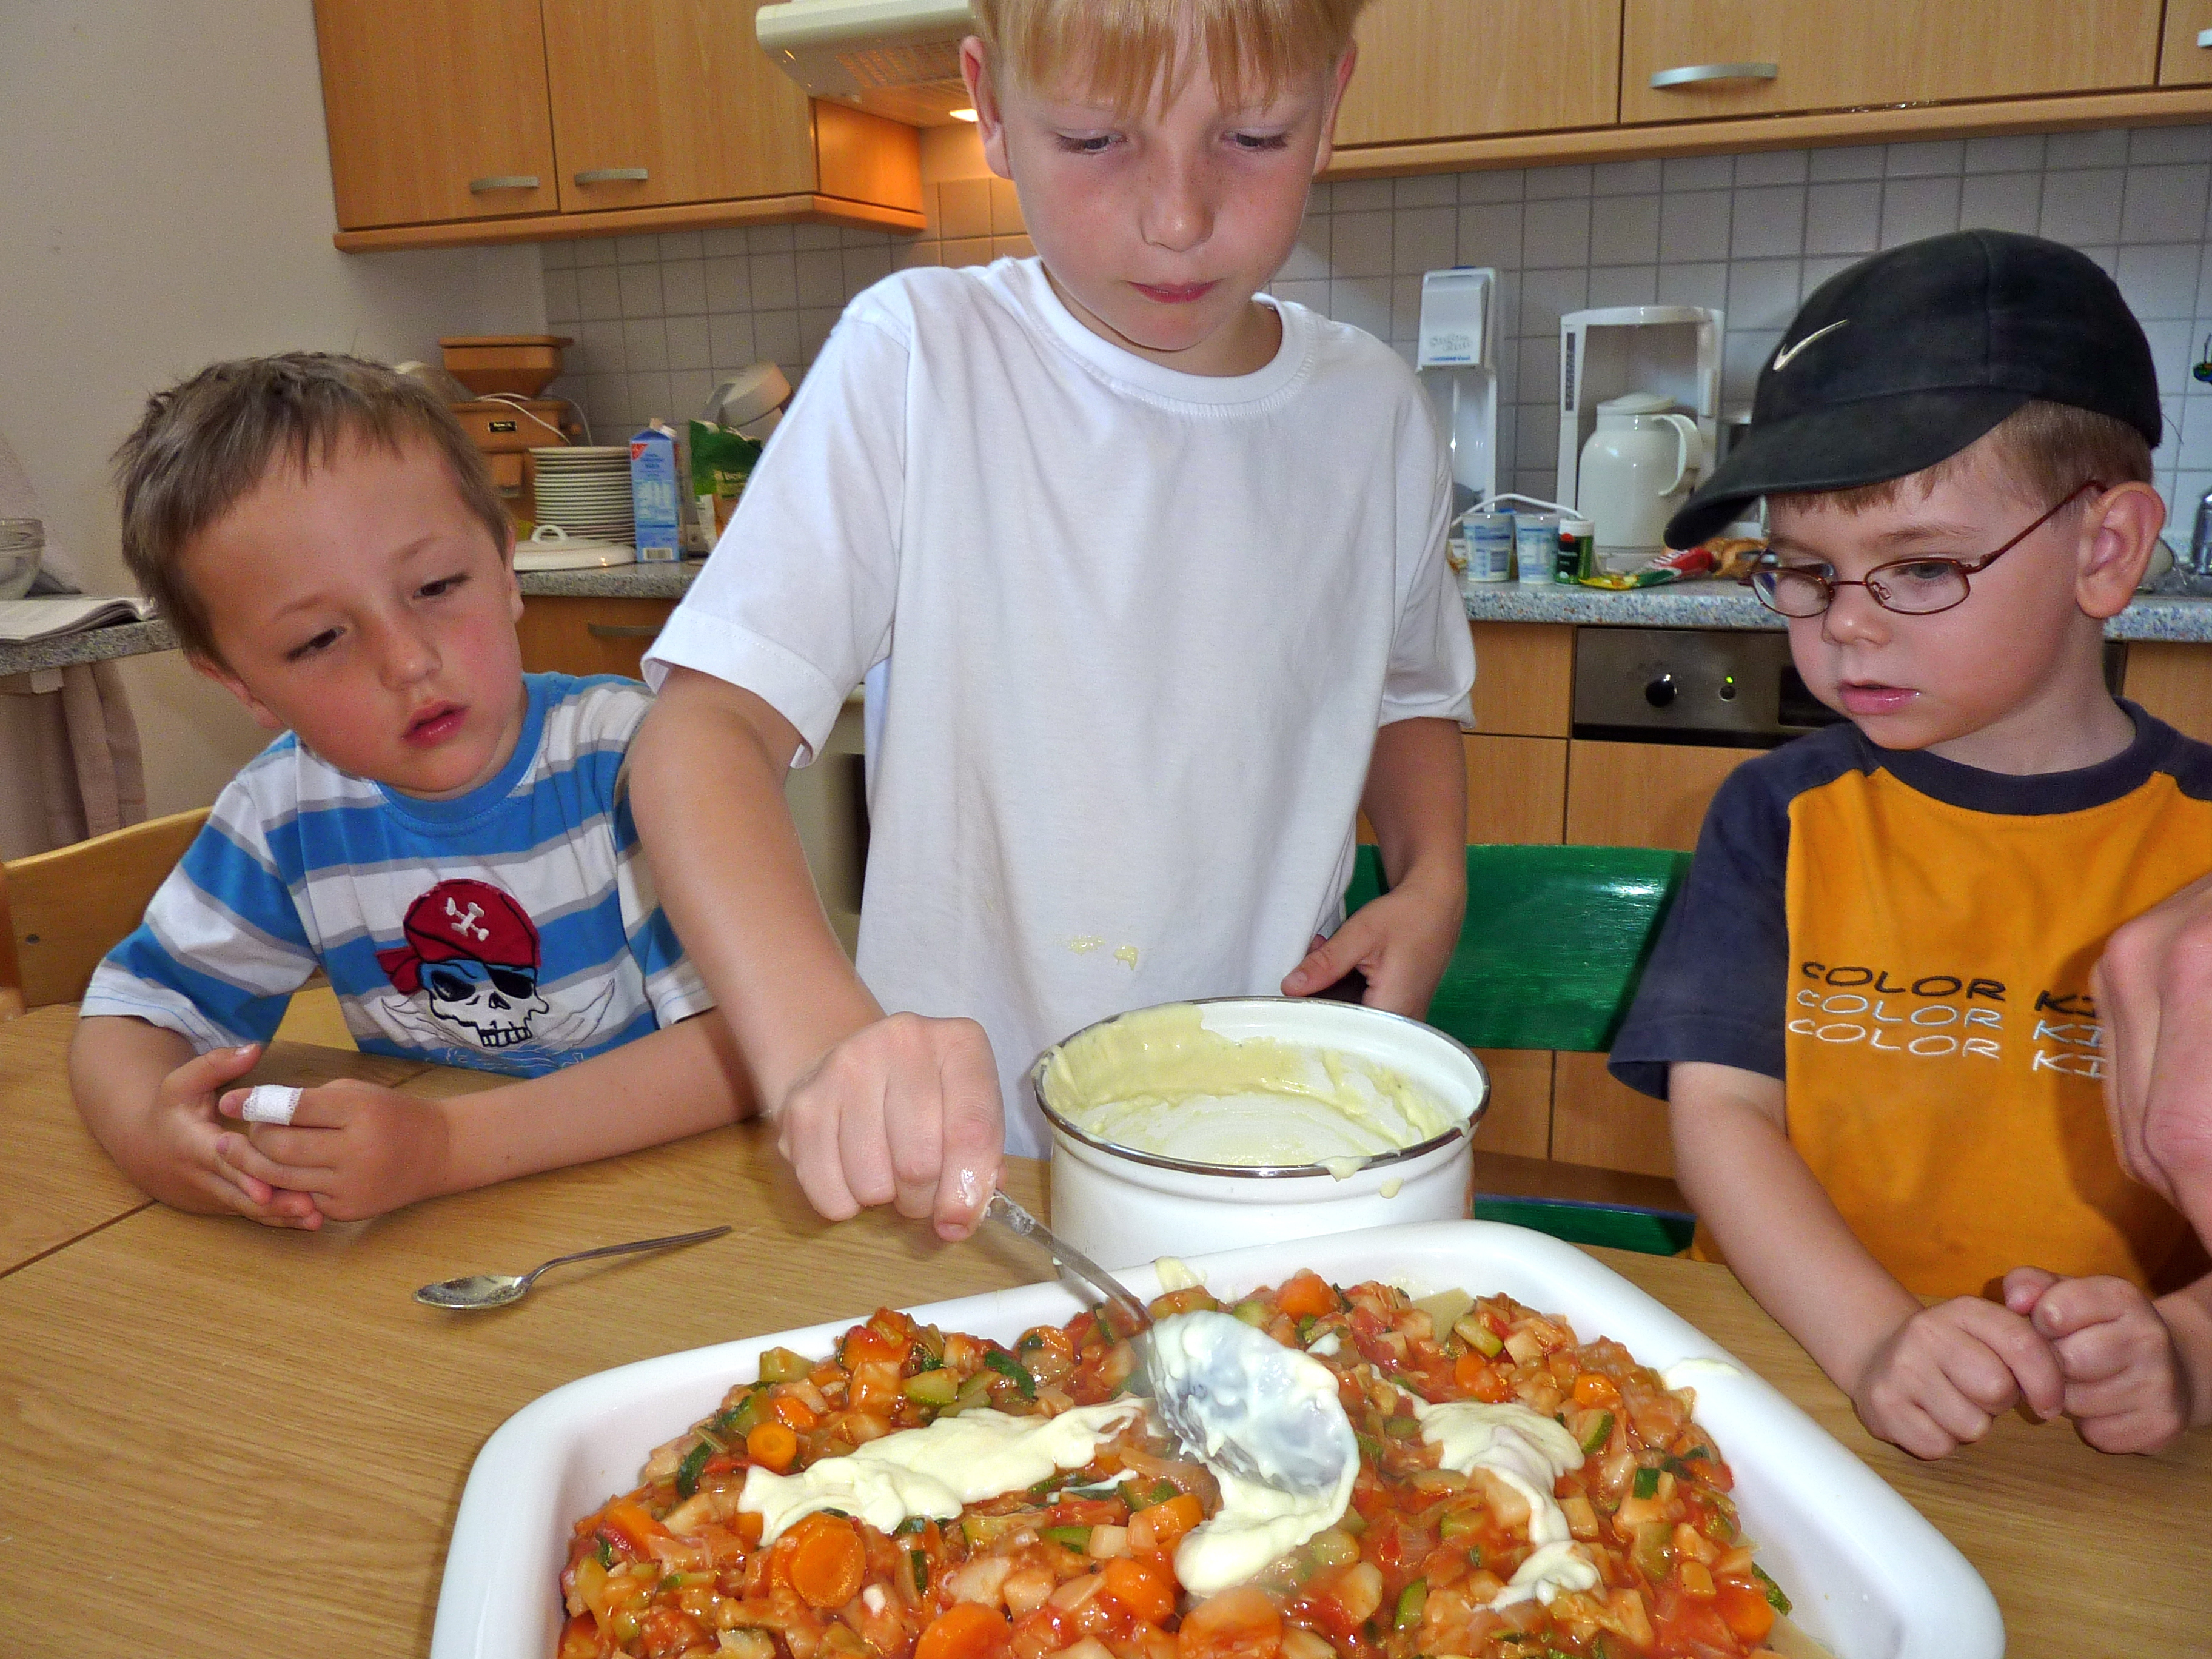 Norderney - Junge bereitet Gemüselasagne vor